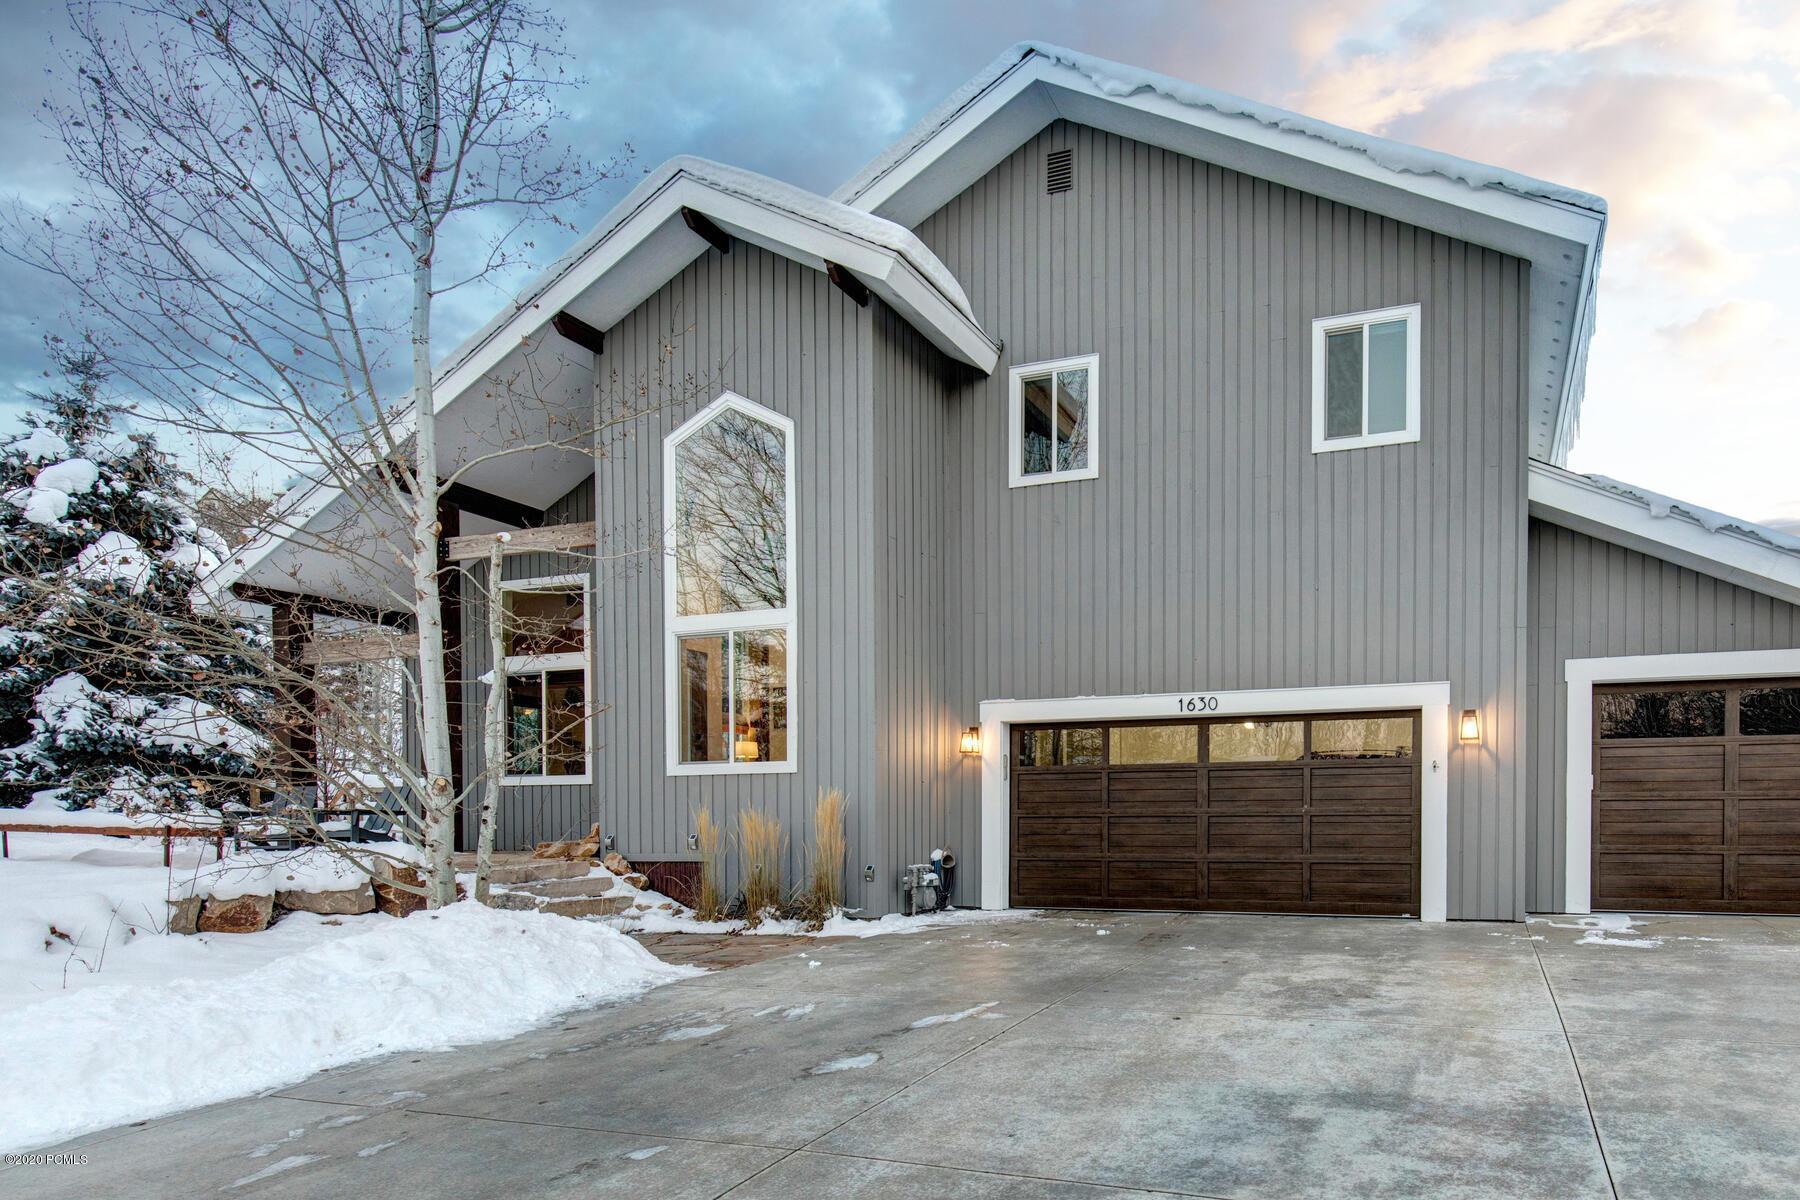 1630 Park Place, Park City, Utah 84098, 5 Bedrooms Bedrooms, ,3 BathroomsBathrooms,Single Family,For Sale,Park,12004436